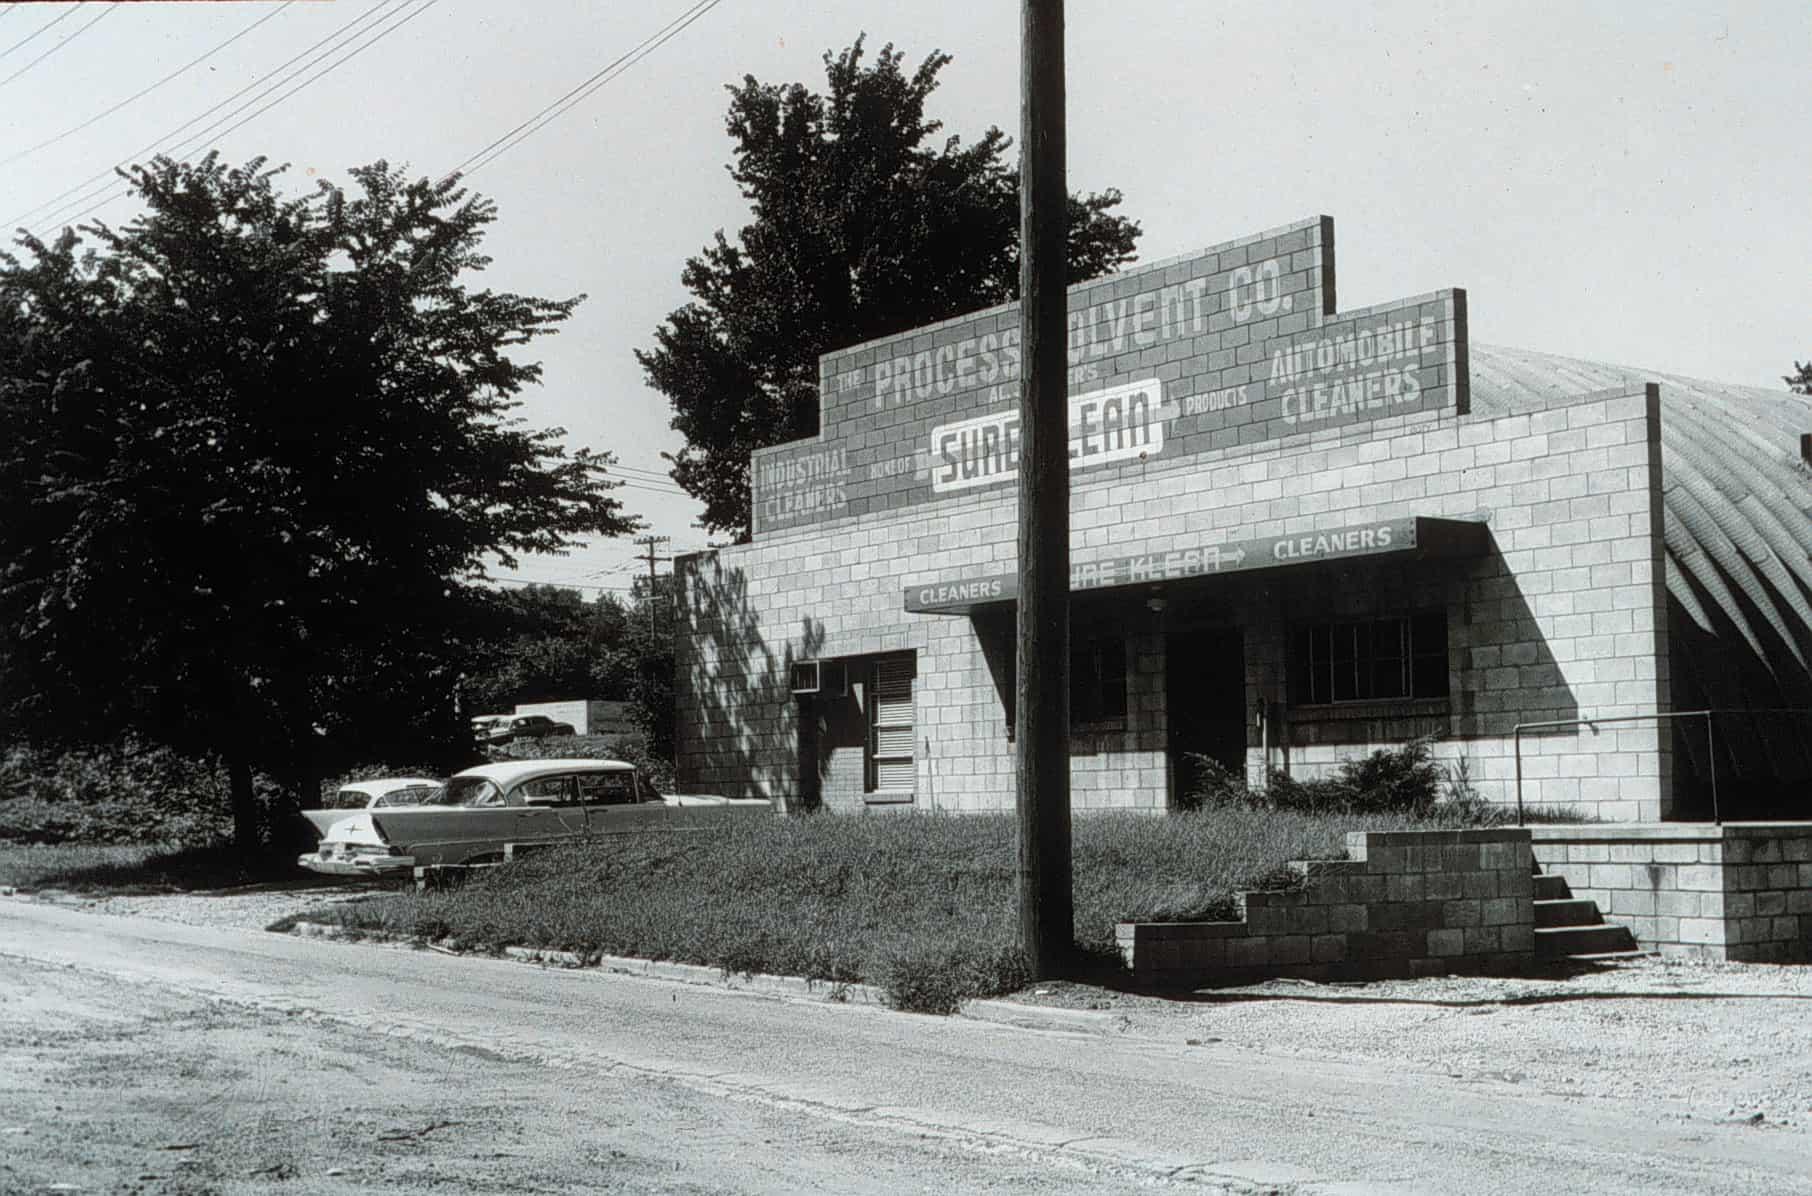 The Process Solvent Company originally was based in Kansas City, Kansas